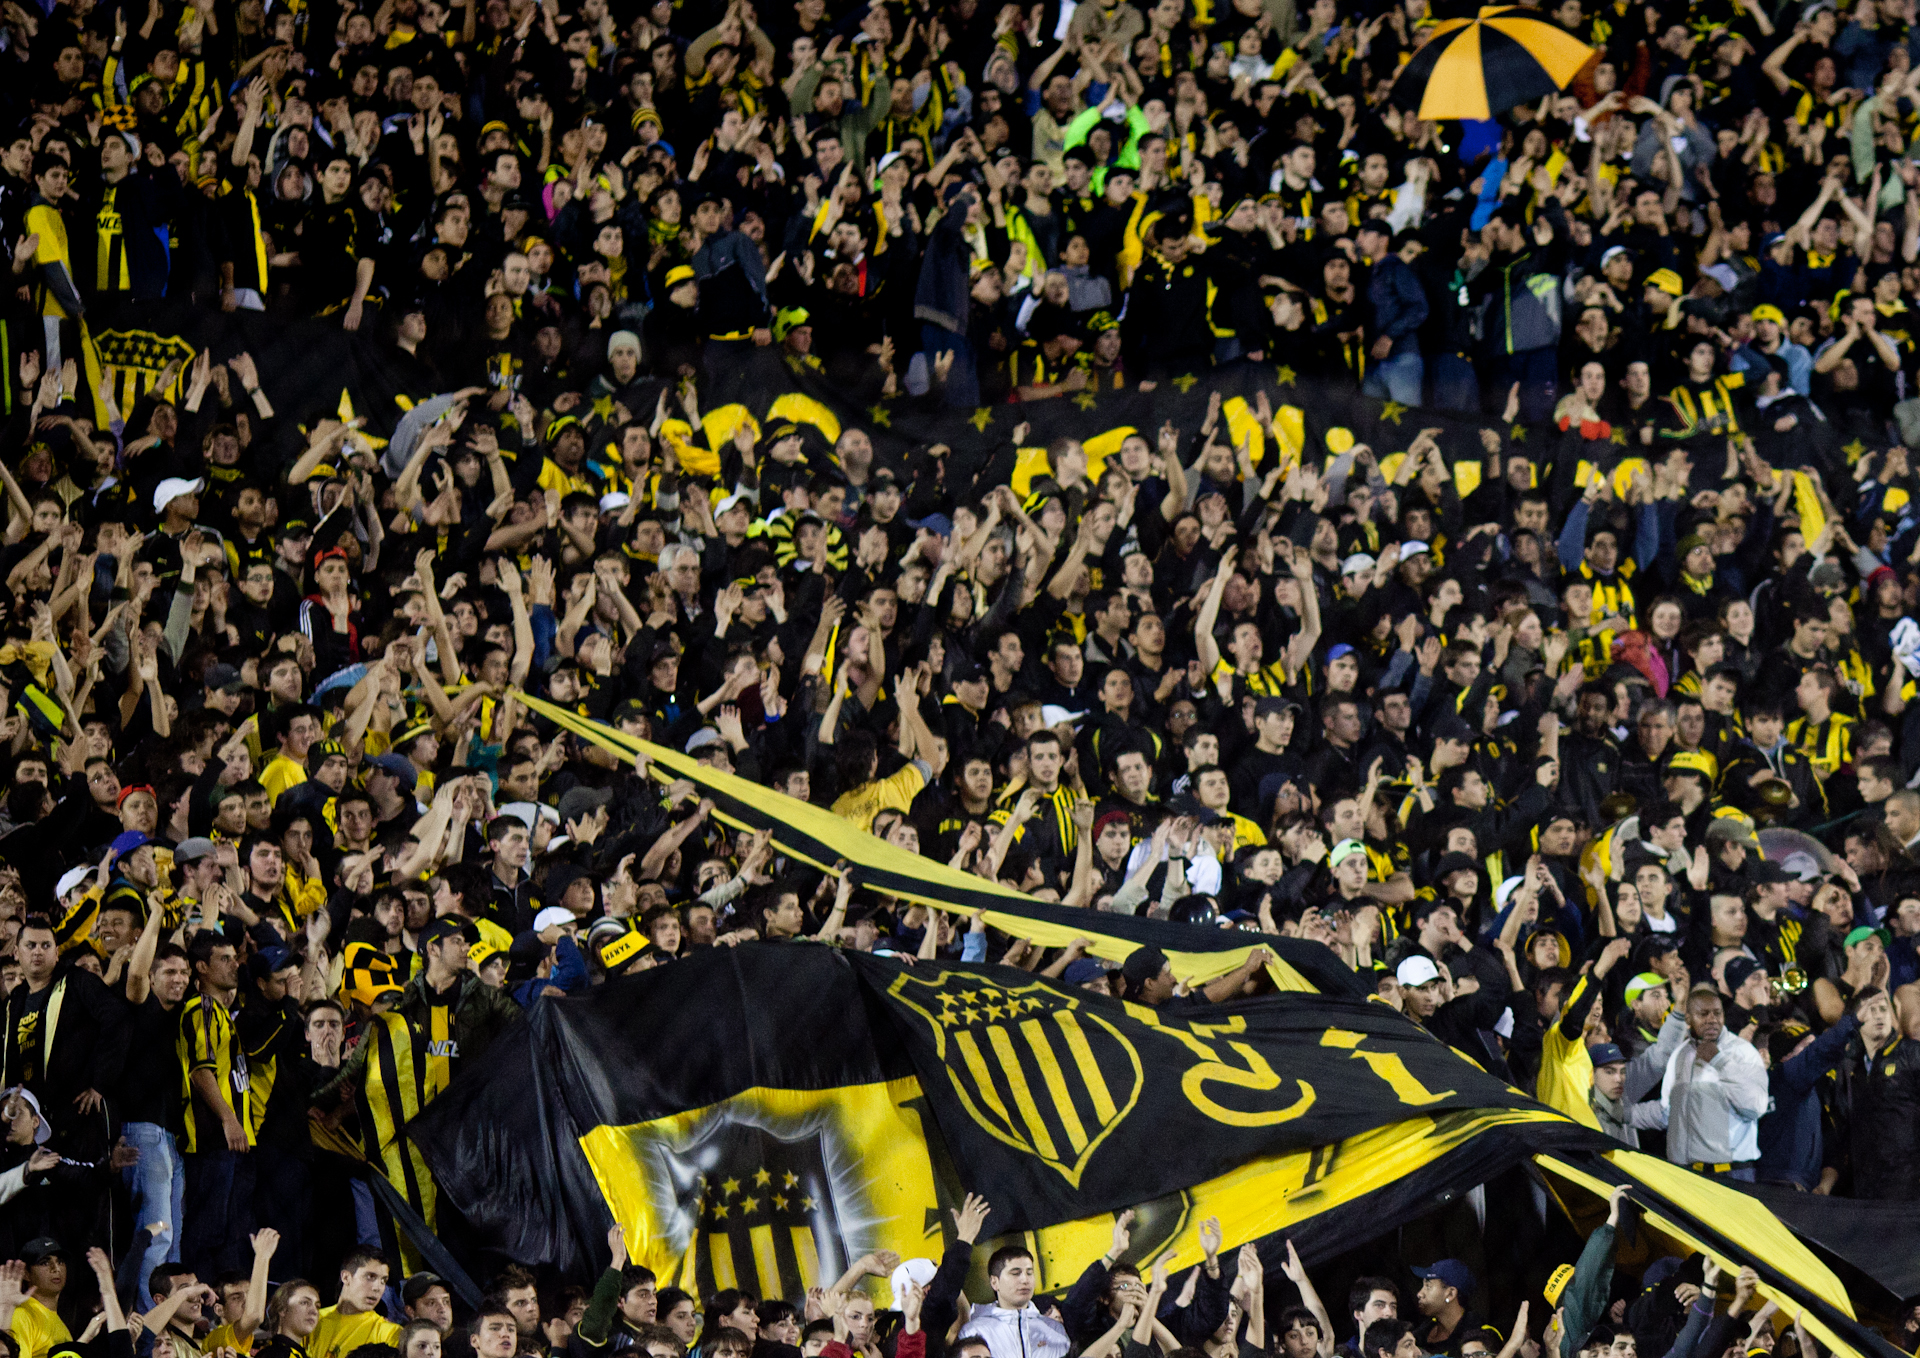 Copa Libertadores de America 2011. / Photo via Jimmy Baikovicius, Flickr